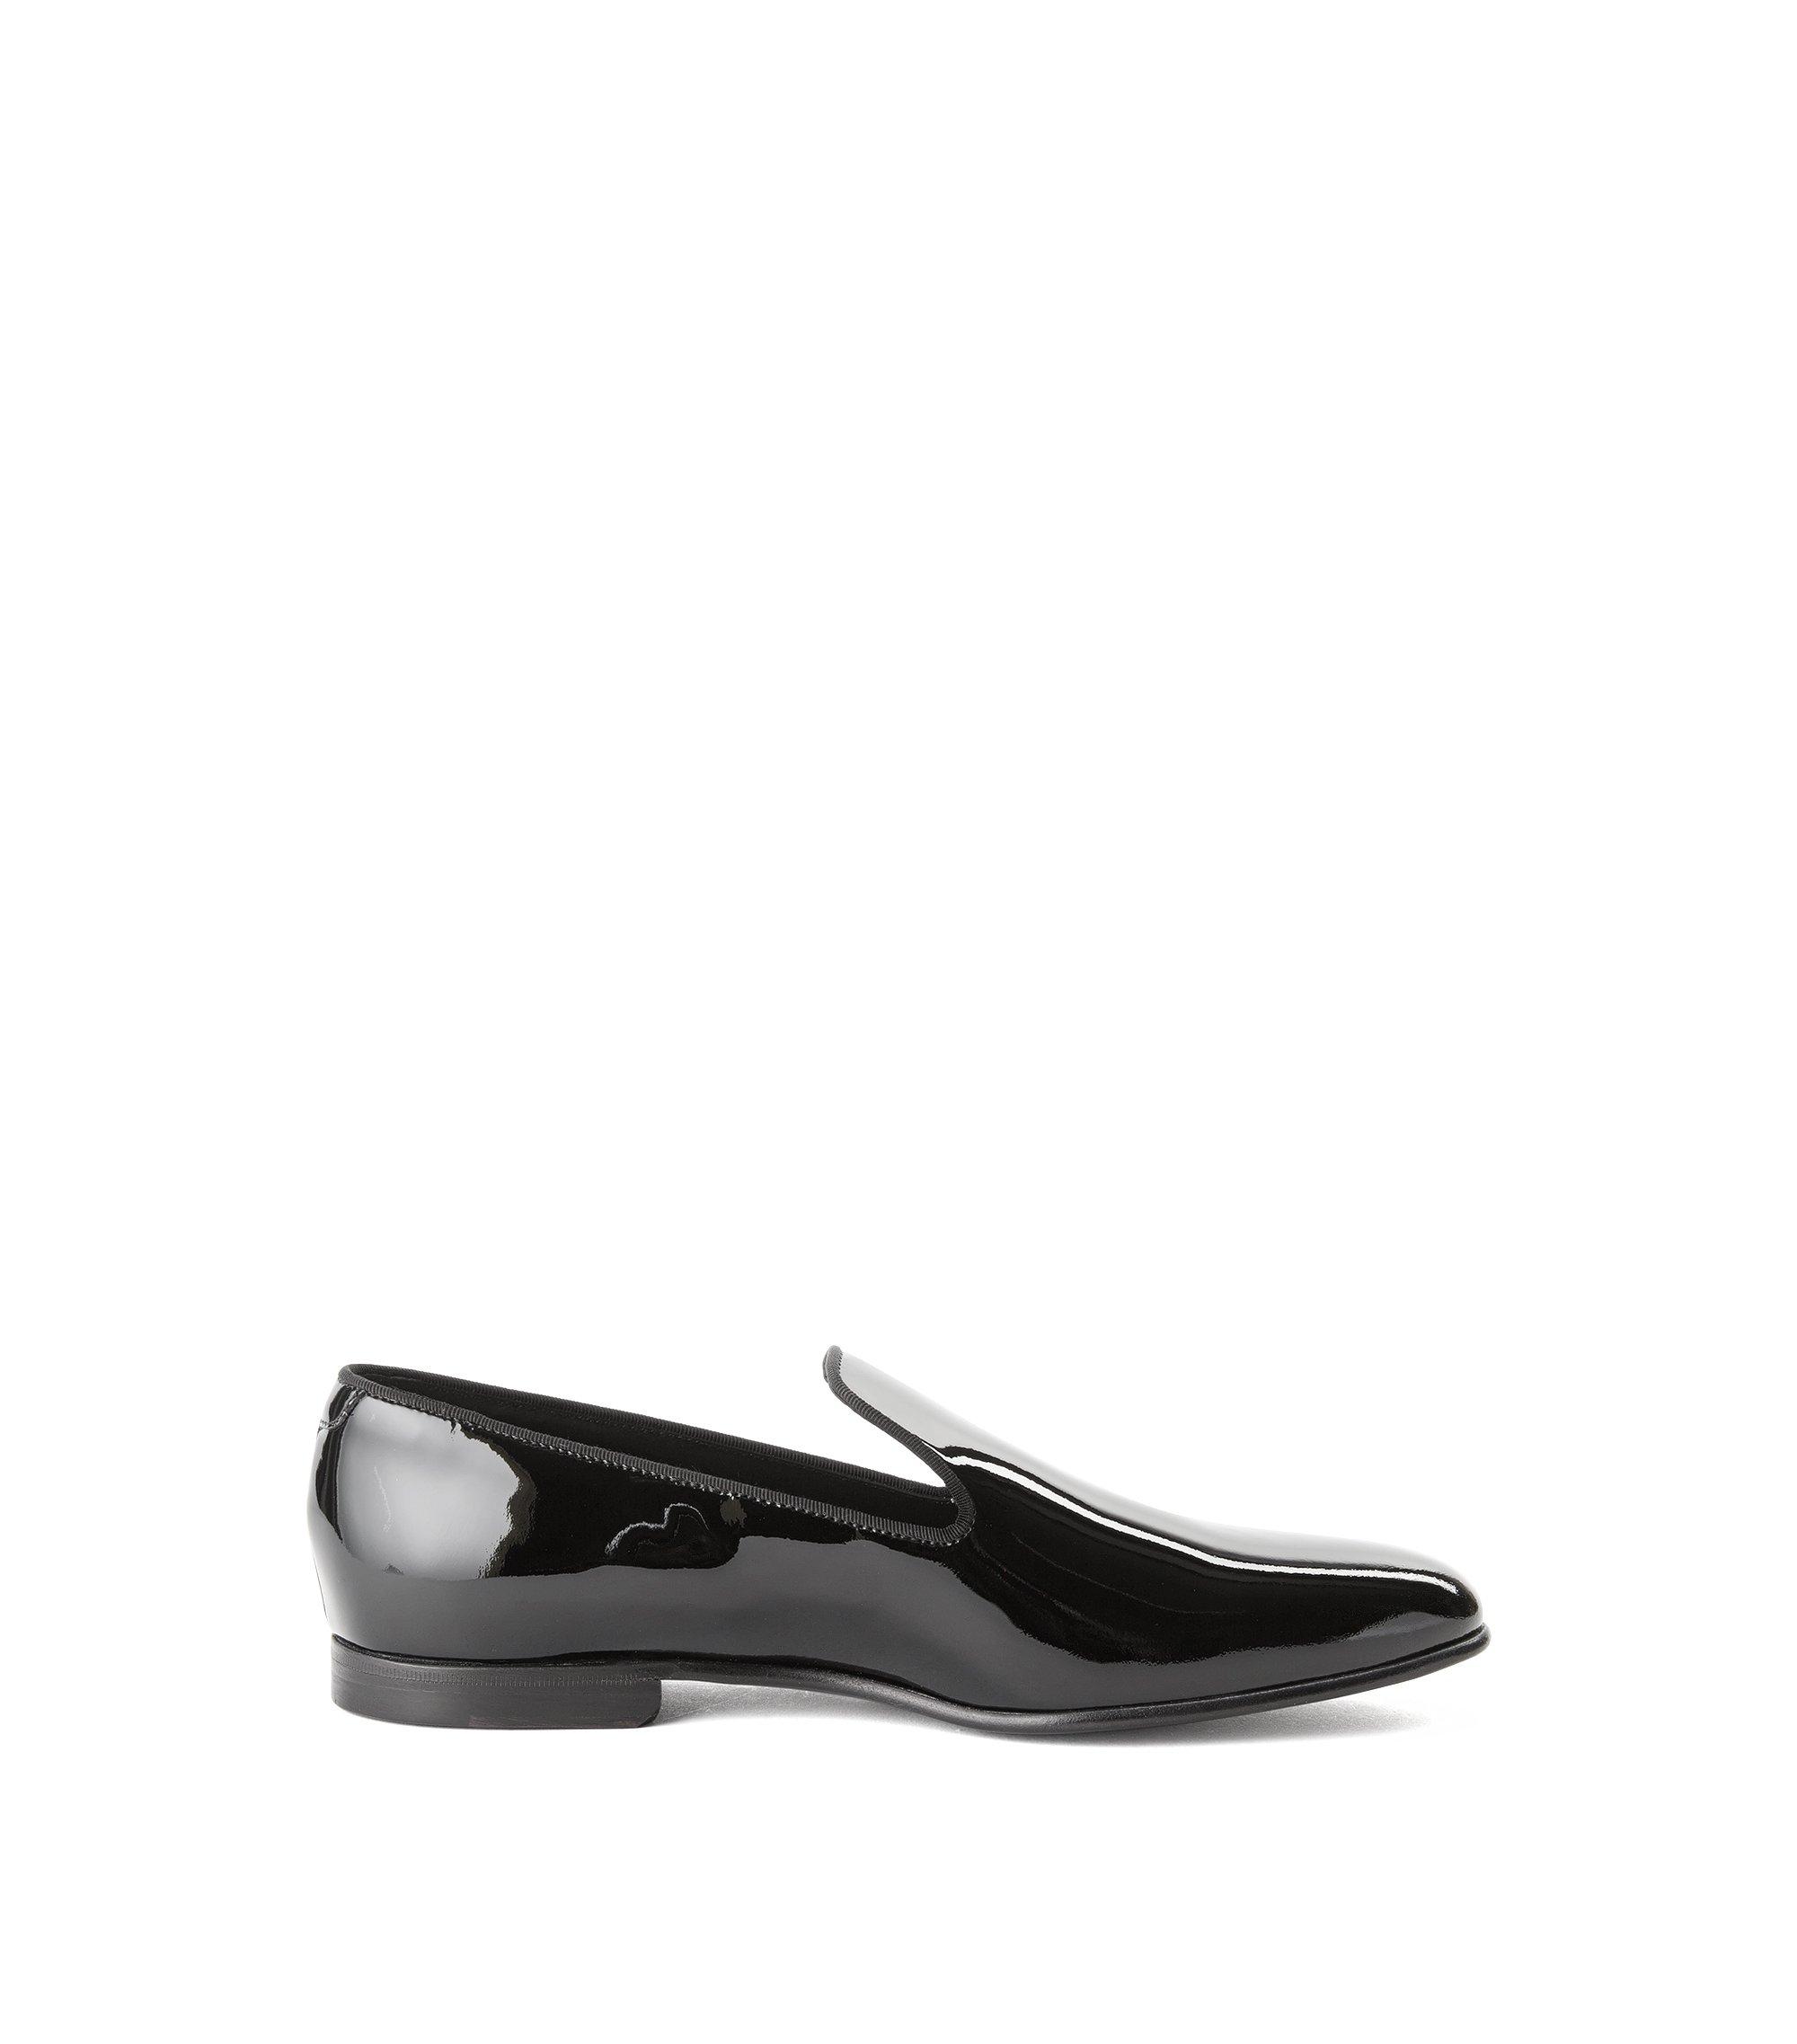 Italian Calfskin Patent Loafer | Loafer P, Black